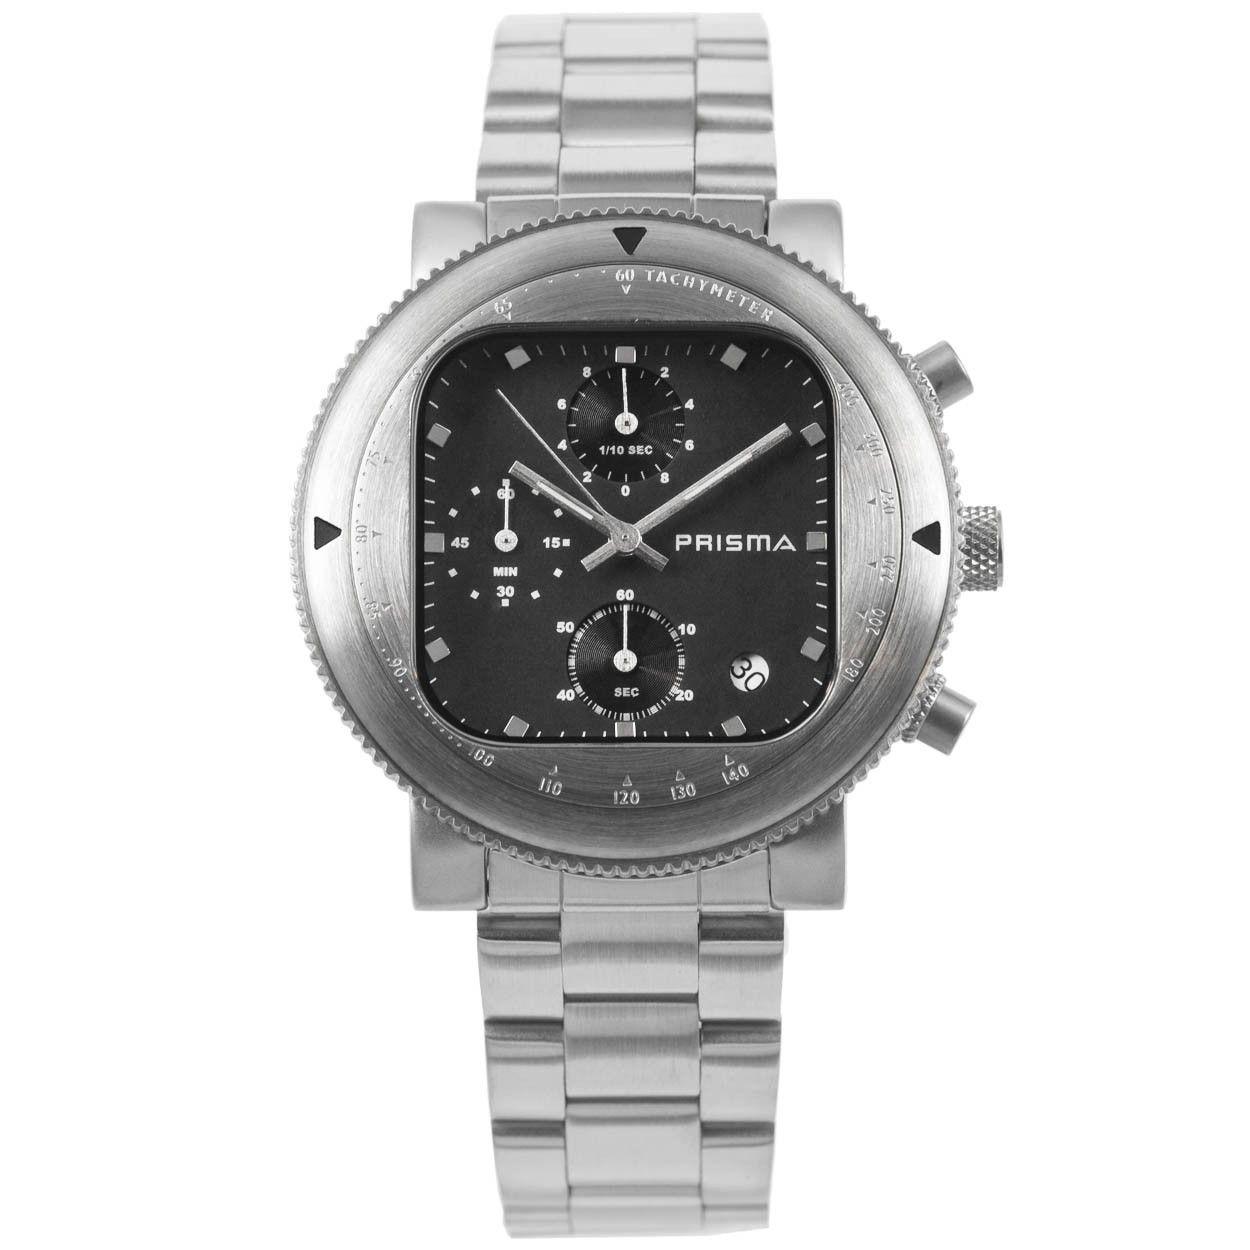 Prisma Herenhorloge chronograaf P.2811 | Prisma Horloges in